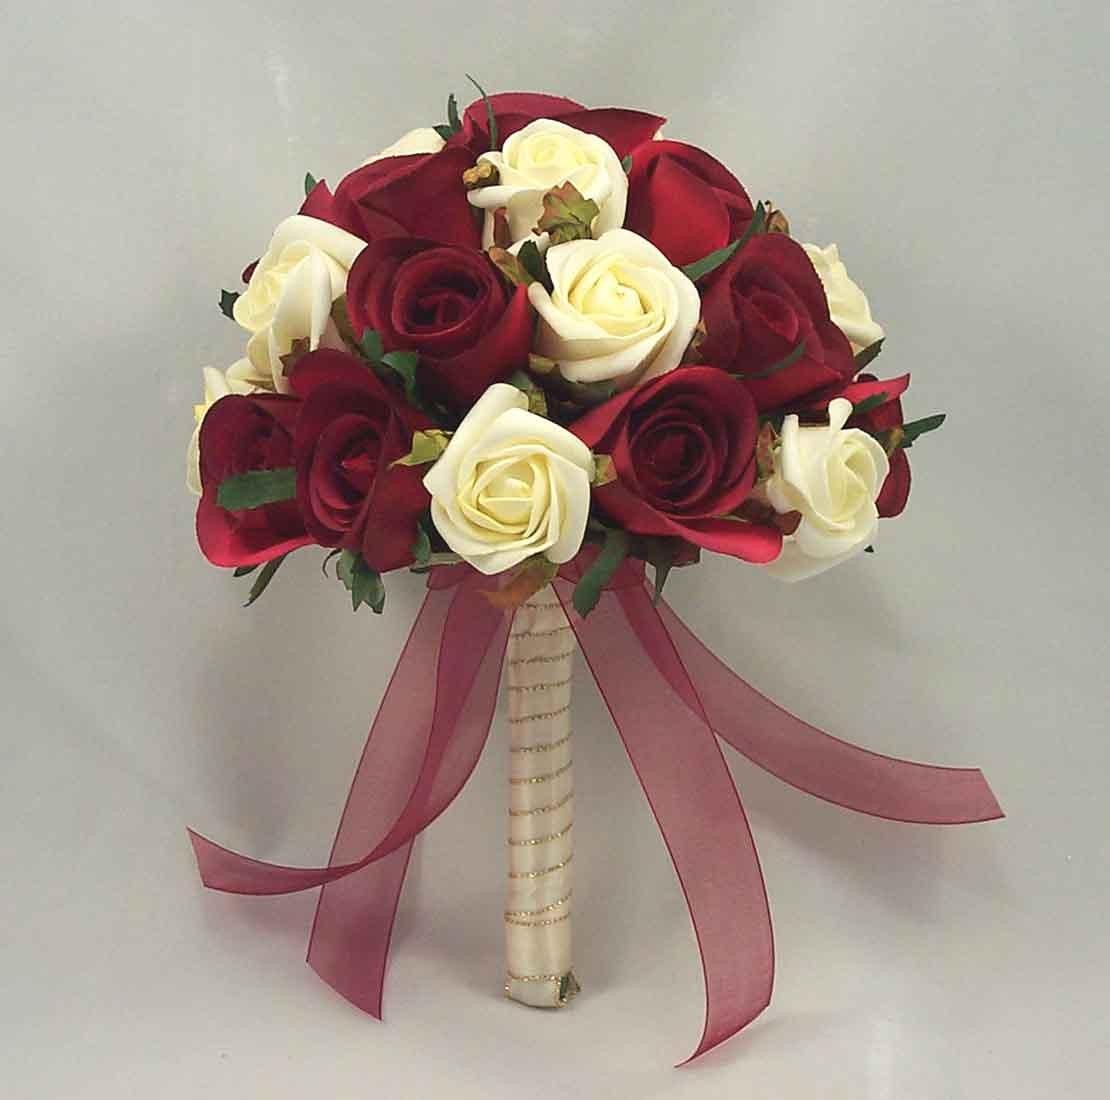 Burgundy & Ivory Rose Table Posy